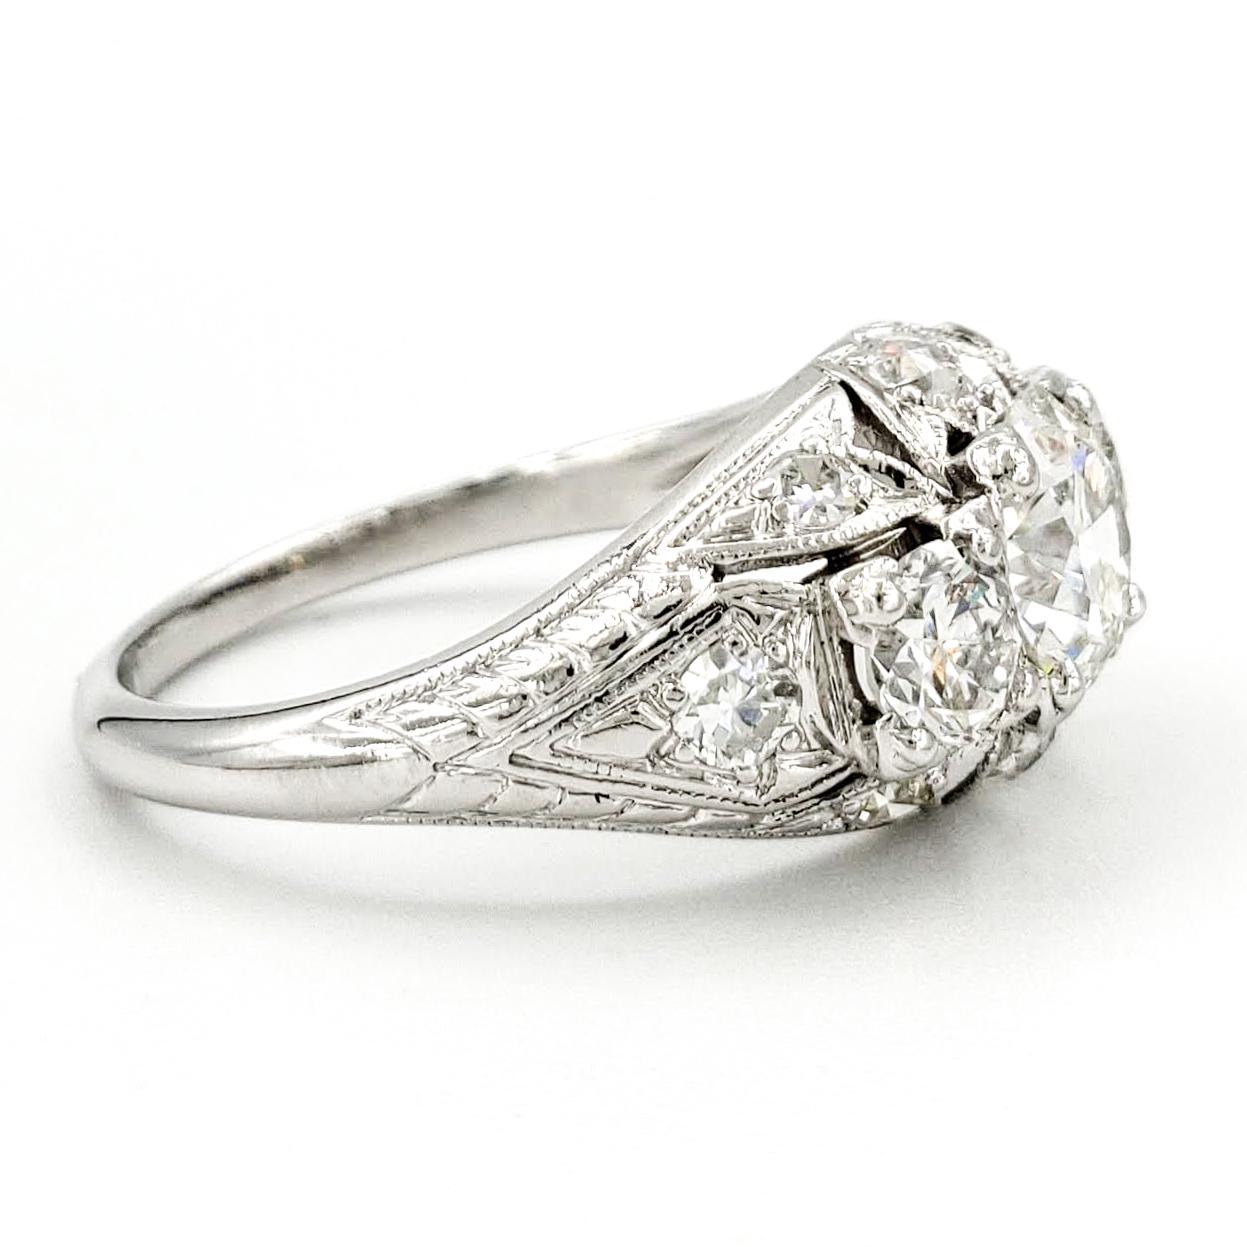 vintage-platinum-engagement-ring-with-0-83-carat-old-european-cut-diamond-gia-i-vs2